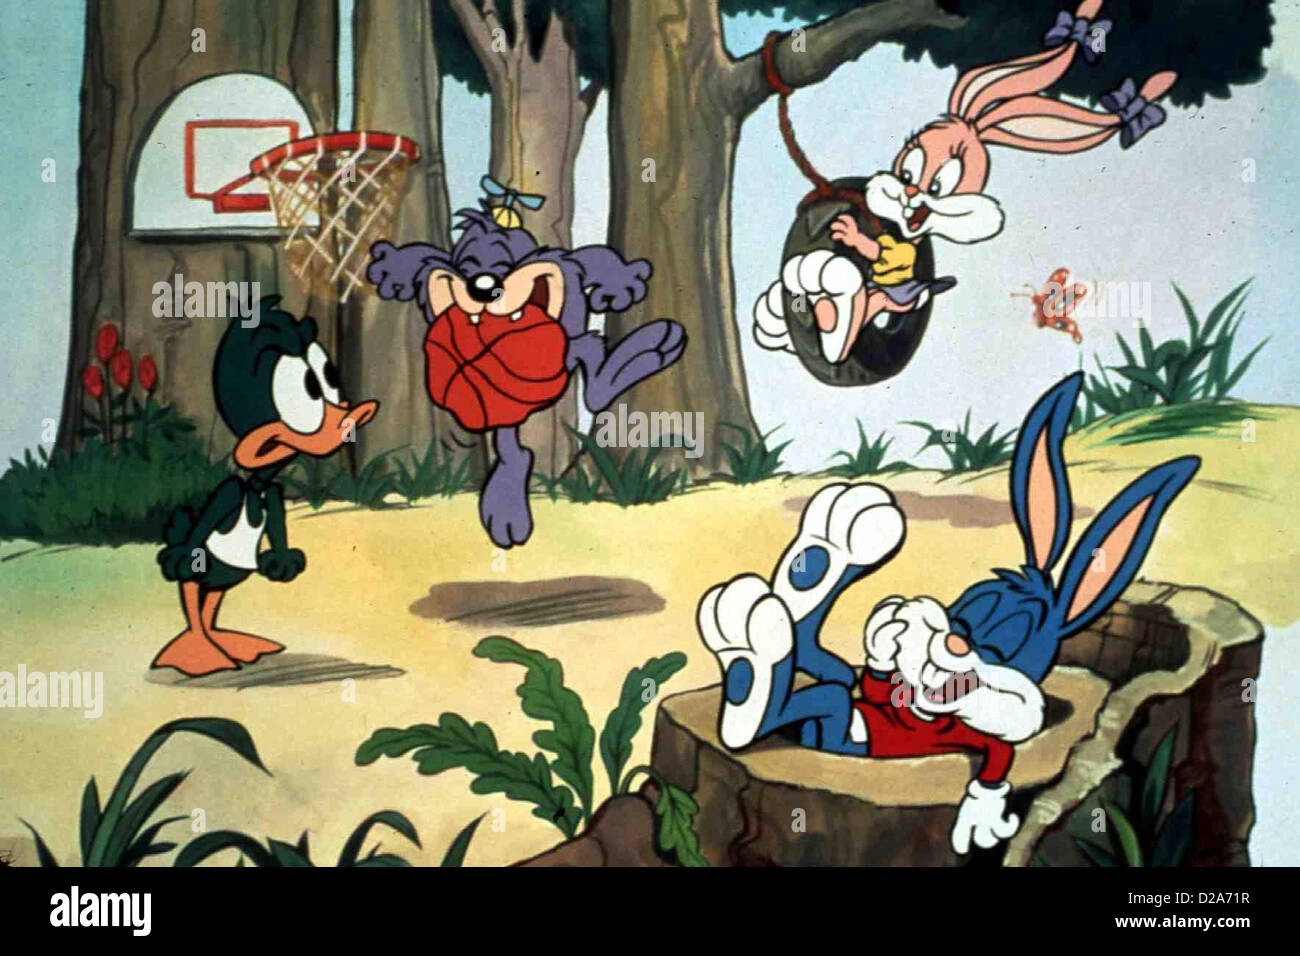 Tiny Toons Abenteuer - Total Verrückte Ferien Tiny Toon Adventures Plucky Duck,?, Babs Bunny Und Buster Bunny Stockbild